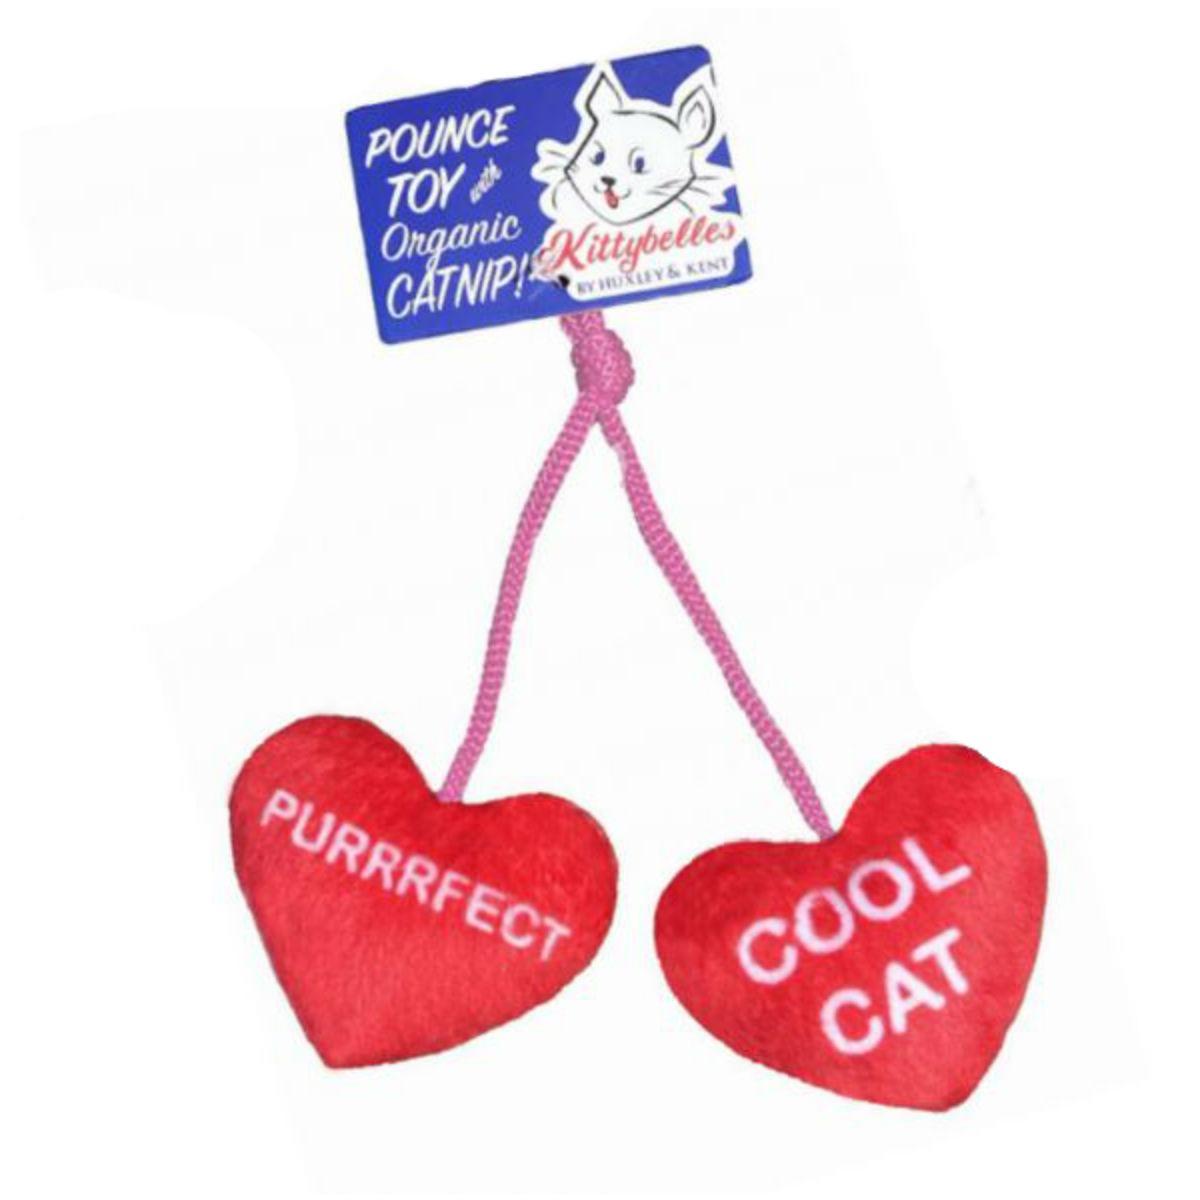 Kittybelles Heart Strings Plush Cat Toy